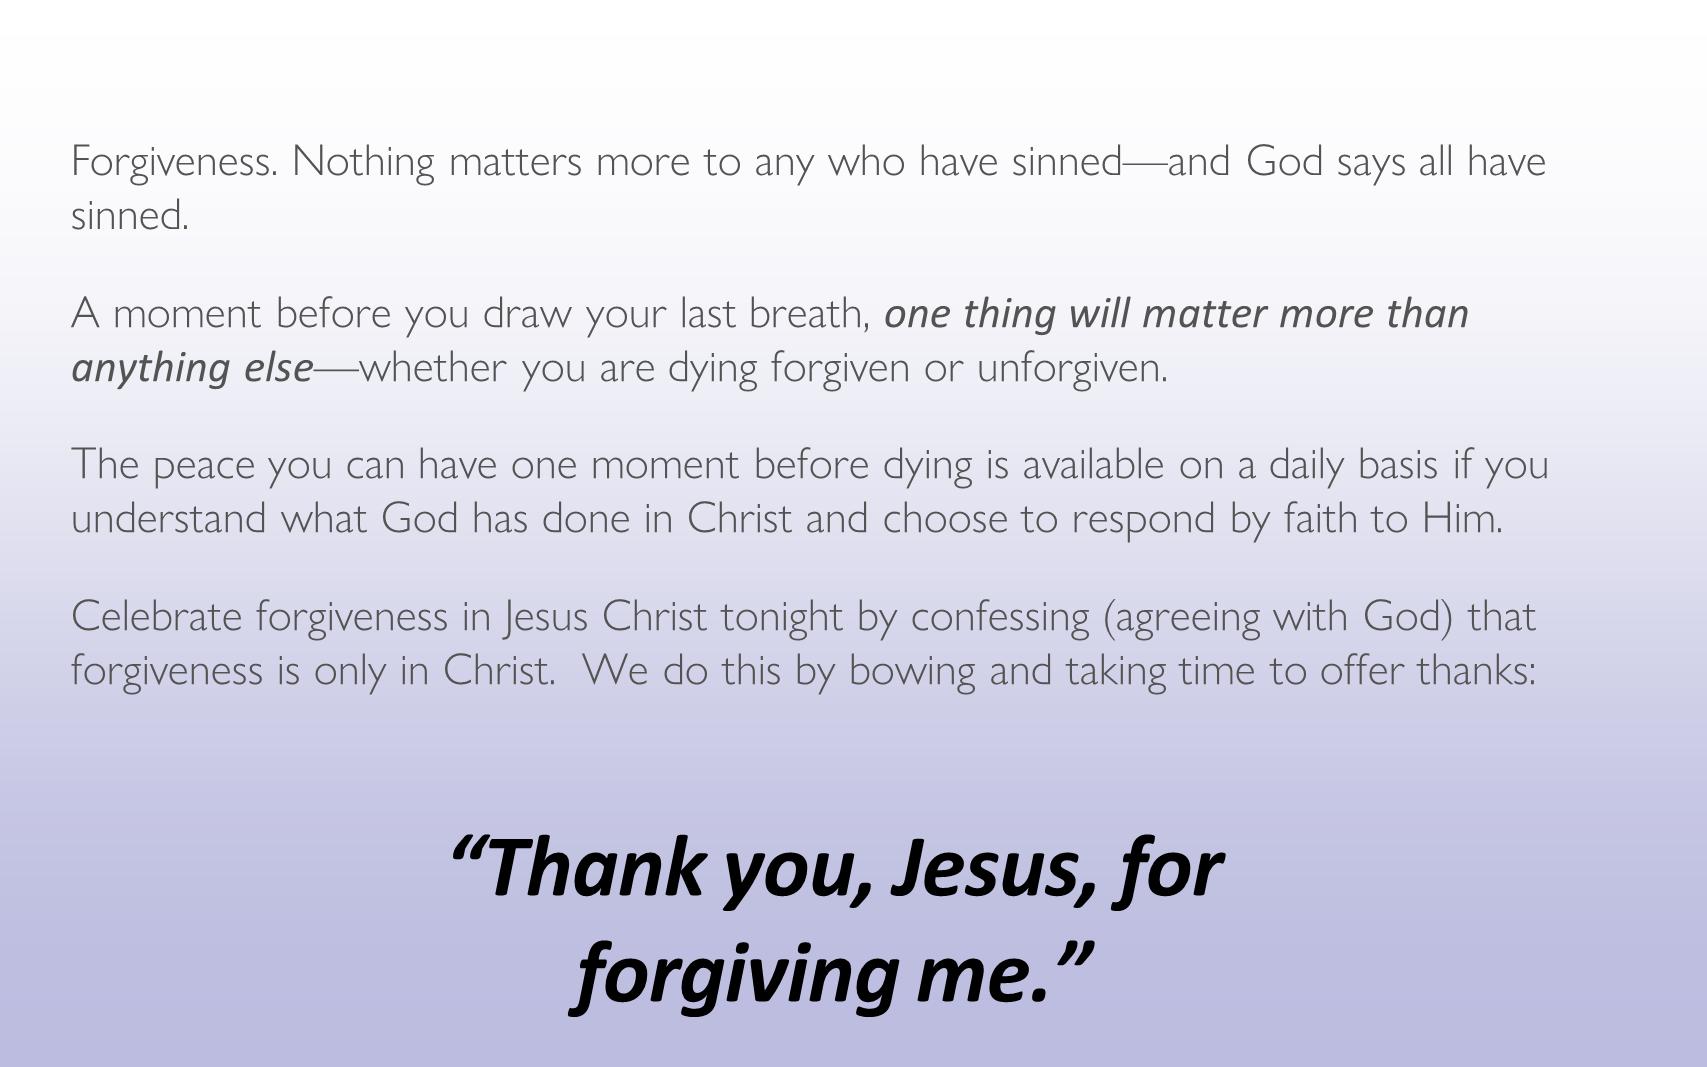 WCC-03 - Proclaiming Christ's Cross Regularly (11)